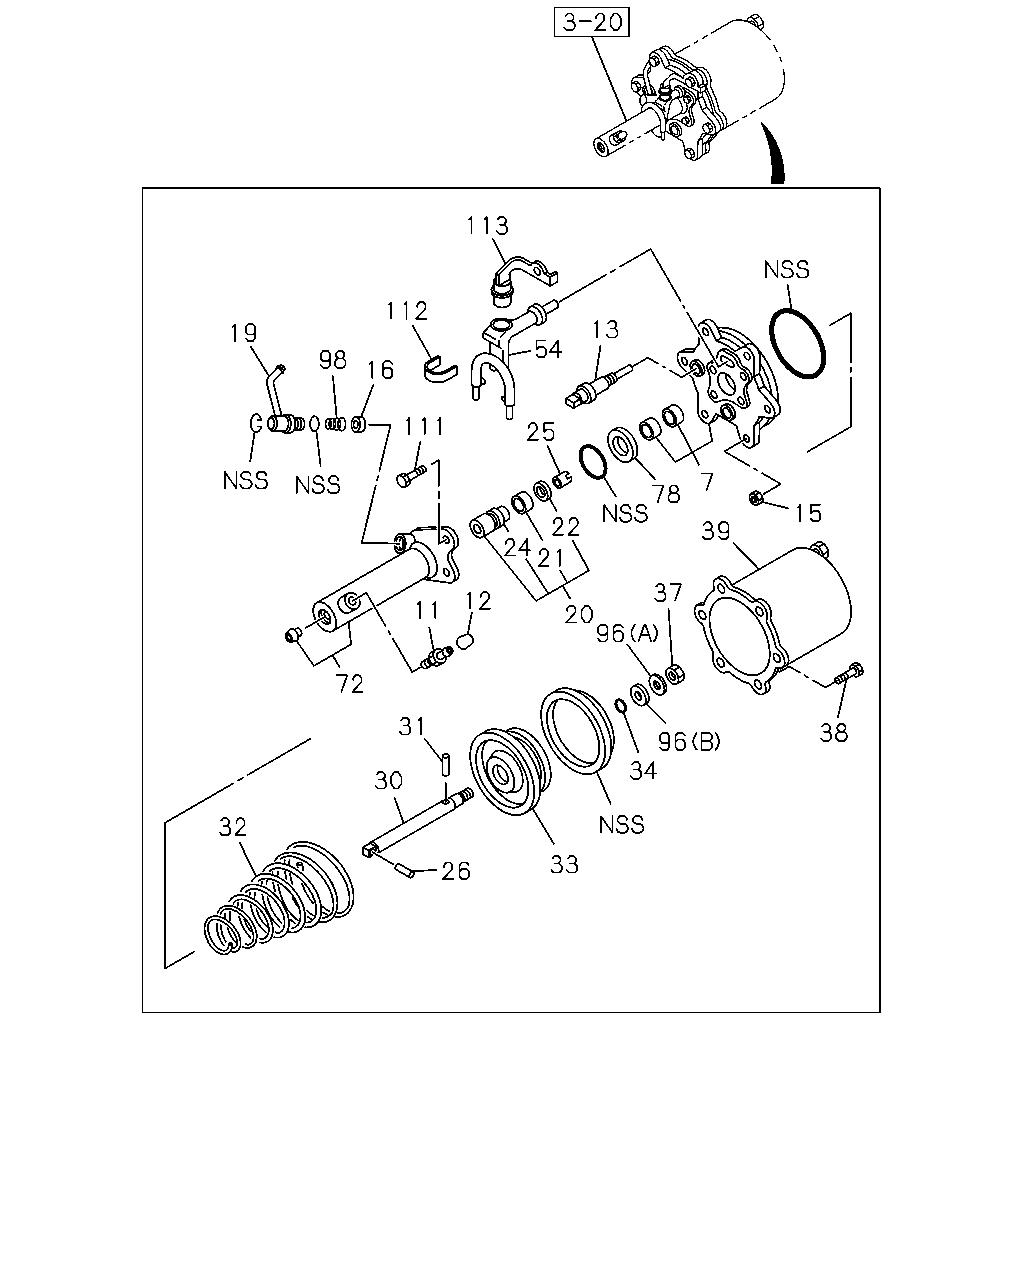 F&G, 10781 - FTR(THAI) 00 - 03, 3 - Brakes, Brake System, 3-33 - AIR